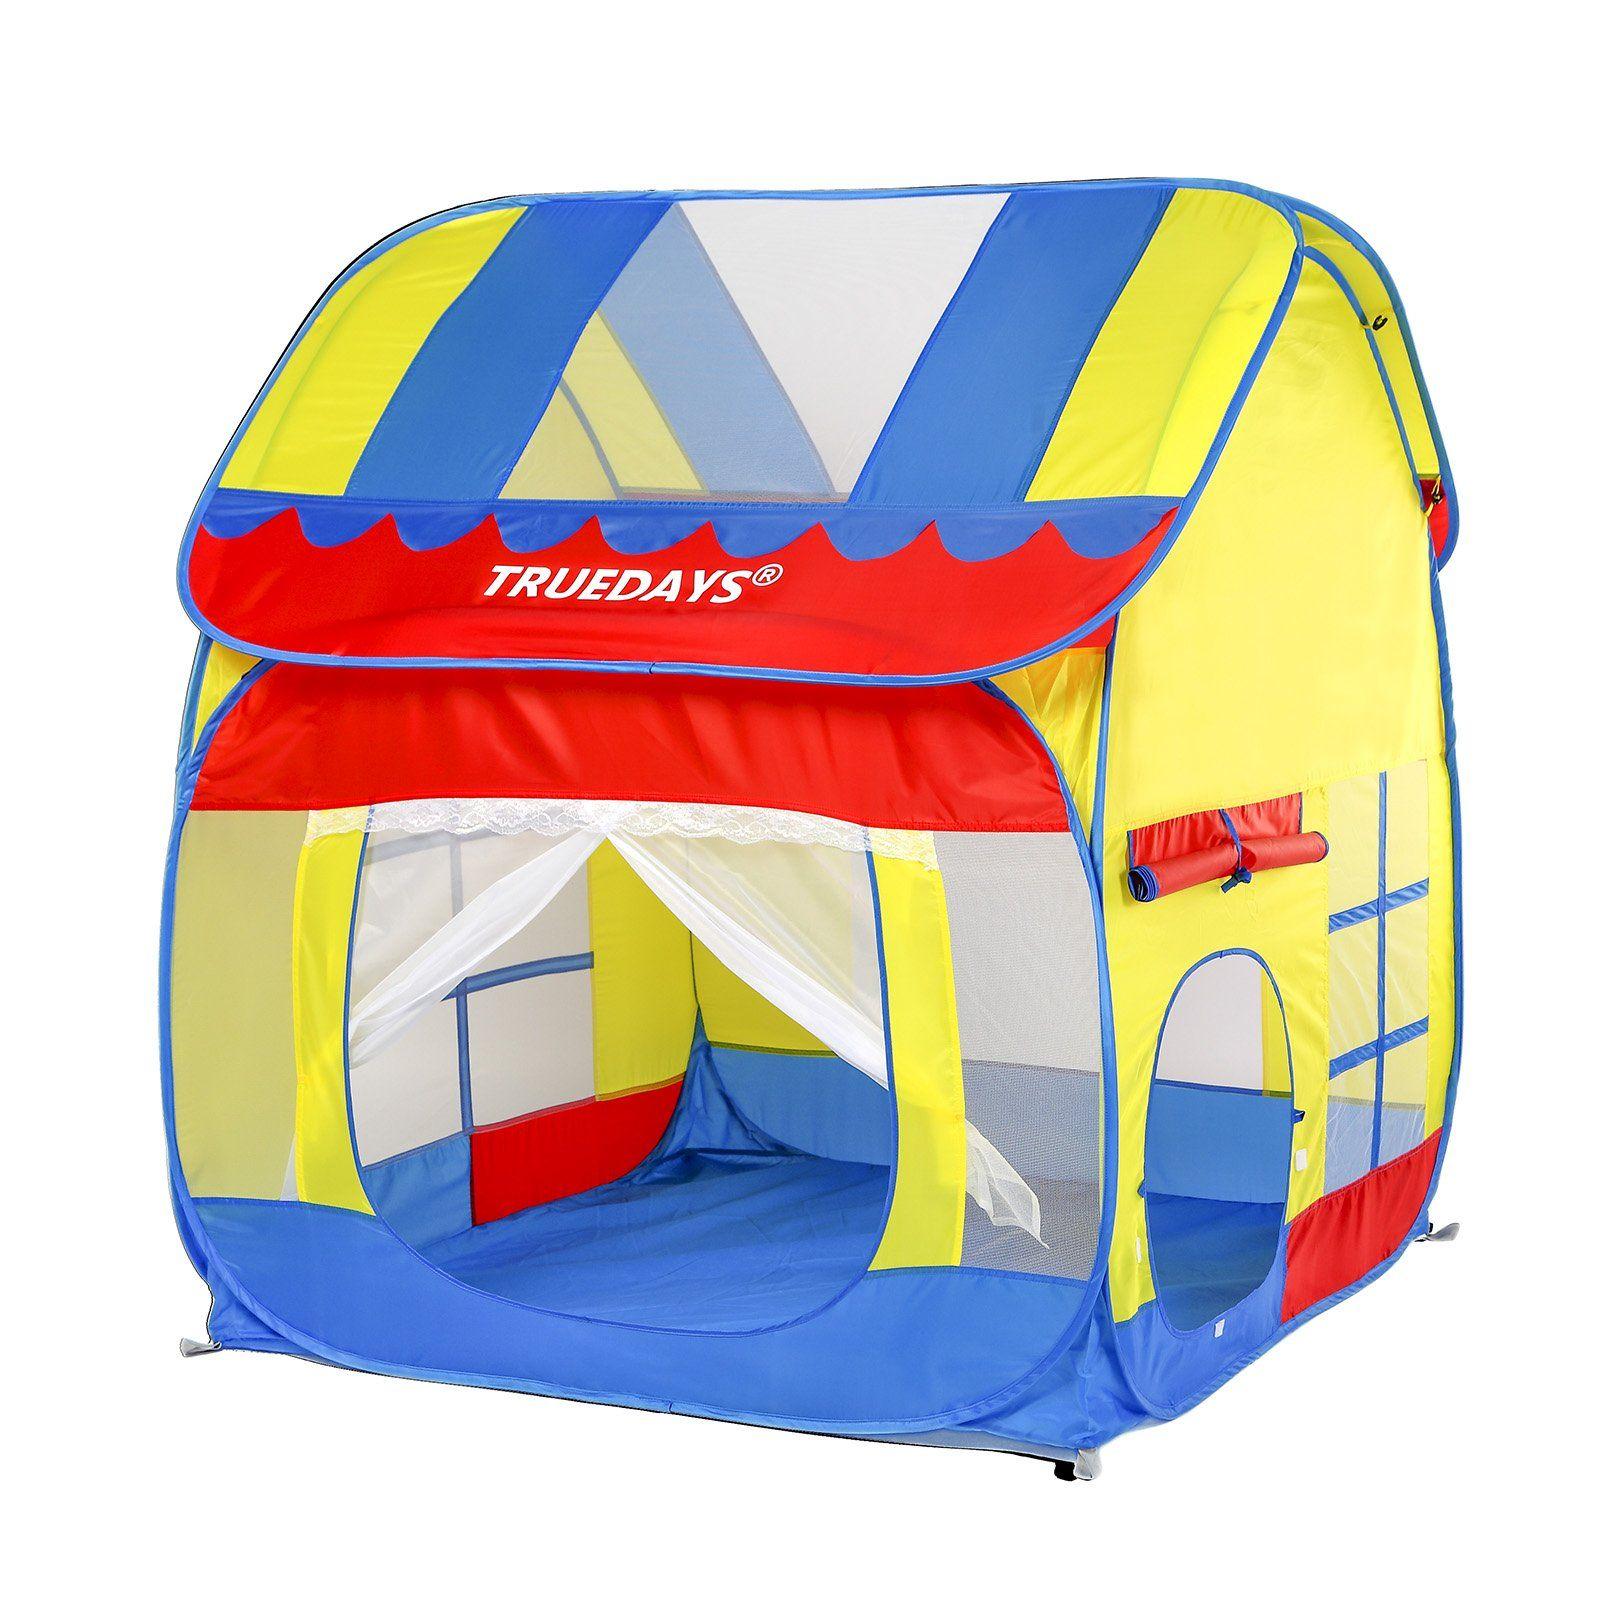 truedays play tent tunnel